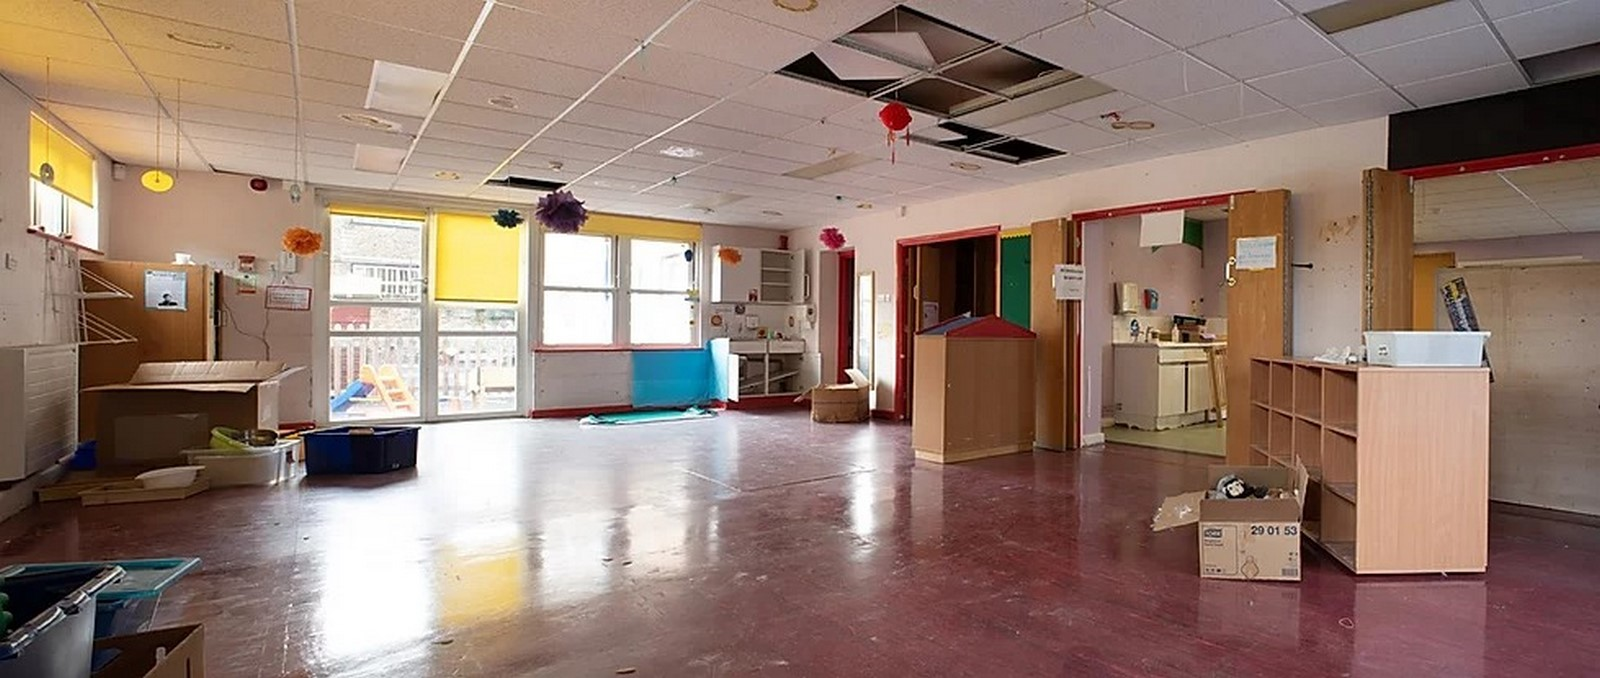 Crisis Café, Lewisham Hospital - Sheet1